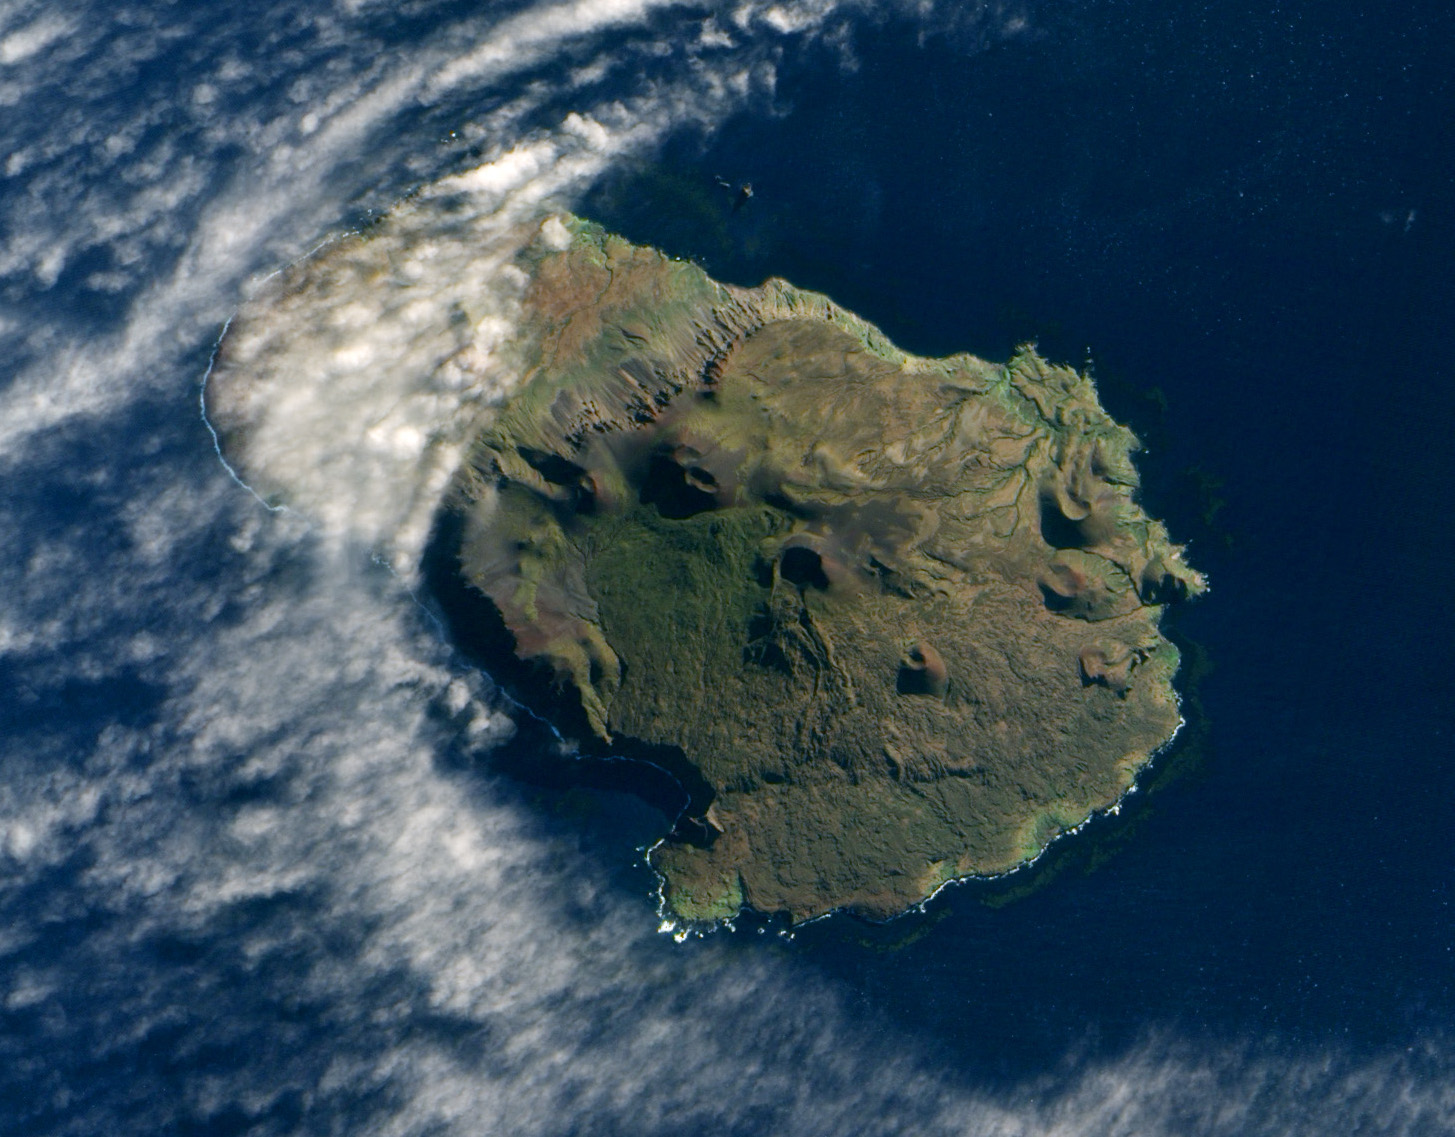 File Prince Edward Island South Africa Eo 1 Ali Satellite Image 5 May 2009 Jpg Wikimedia